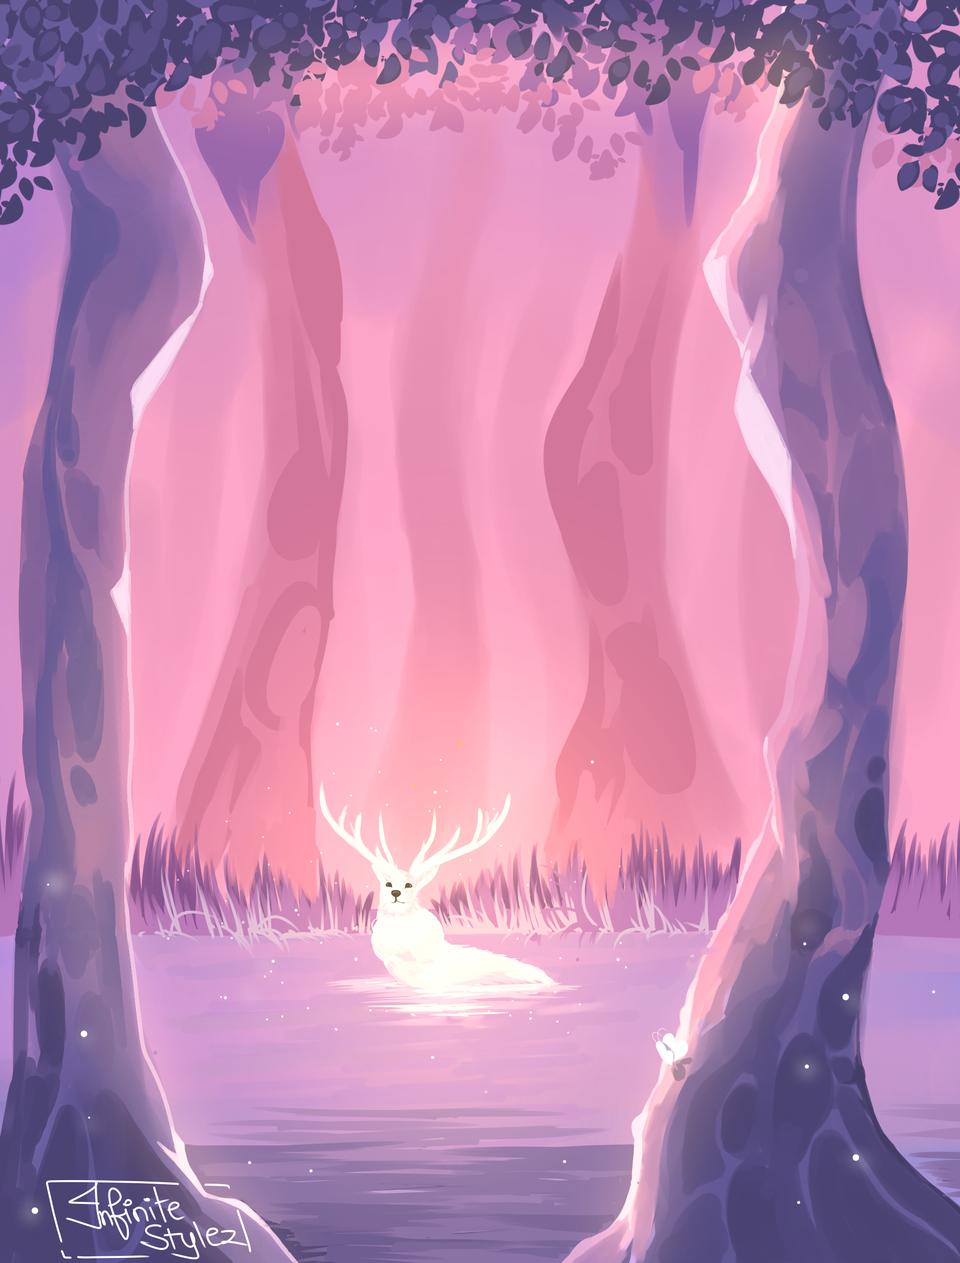 rein der Illust of Infinite stylez medibangpaint butterfly goodquality forest raindeer fireflies soft infinitestylez smooth trees